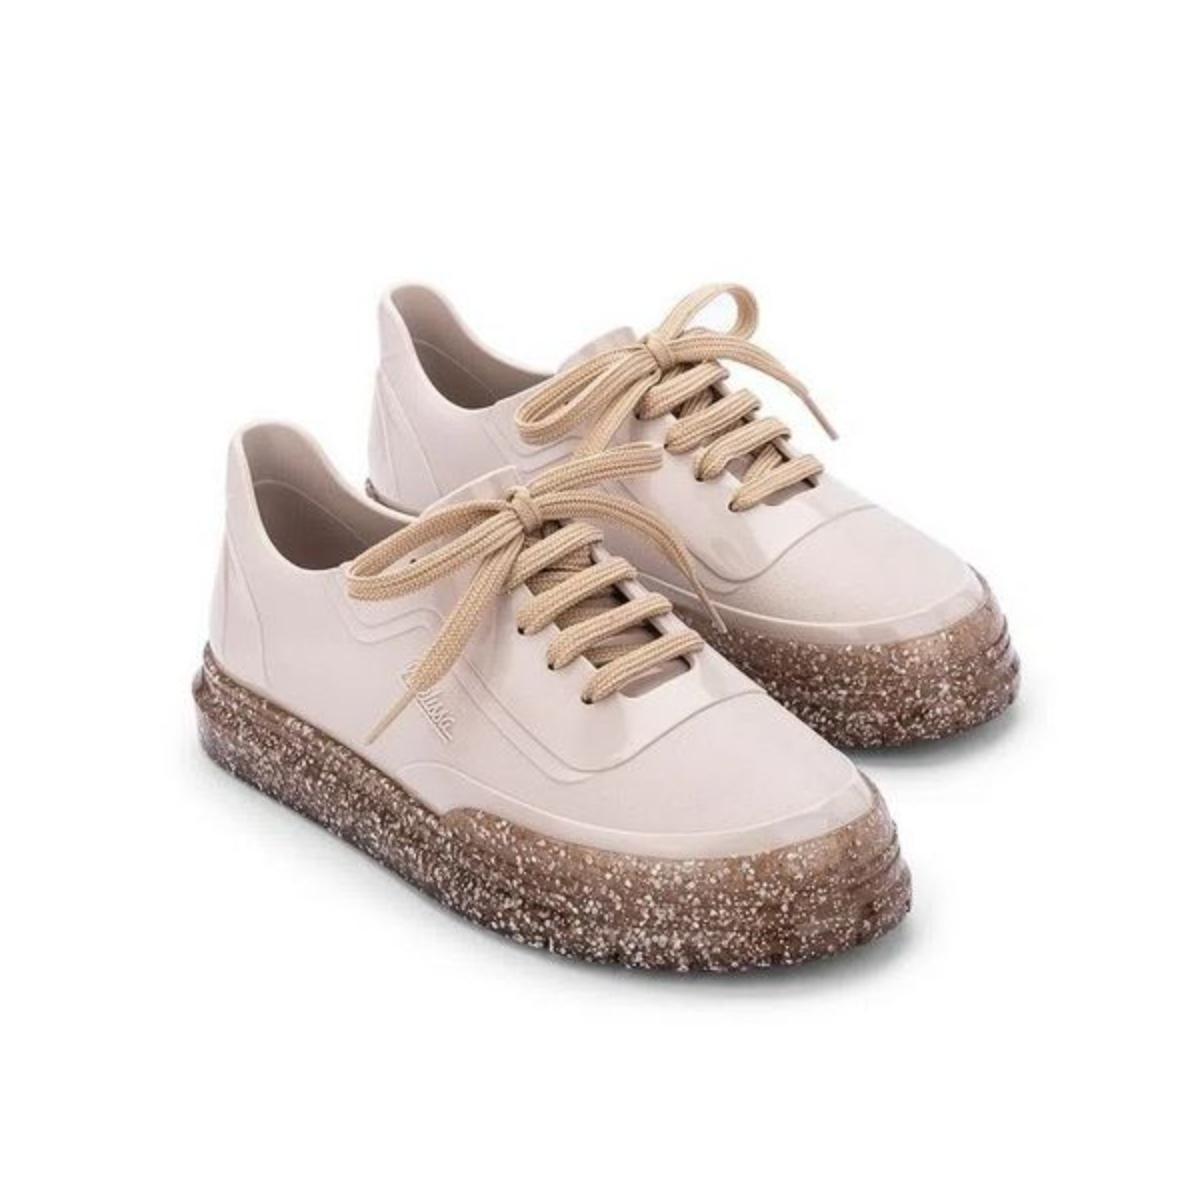 Tênis Feminino Melissa 33306 52326 Classic Sneaker Bege Glitter